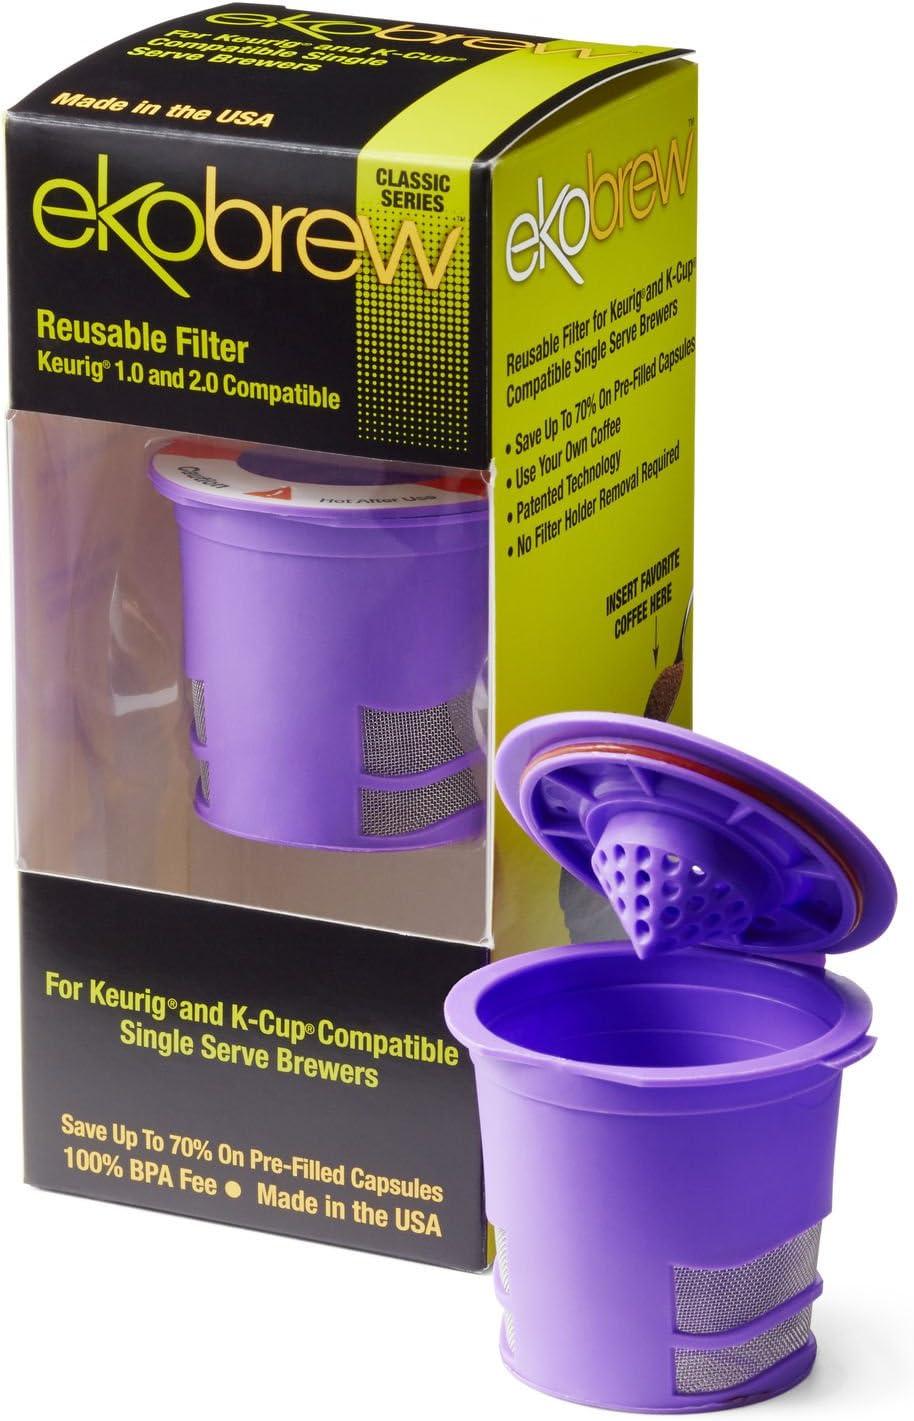 Ekobrew Classic Reusable Filter, Keurig 1.0 und 2.0 Compatible - Violet